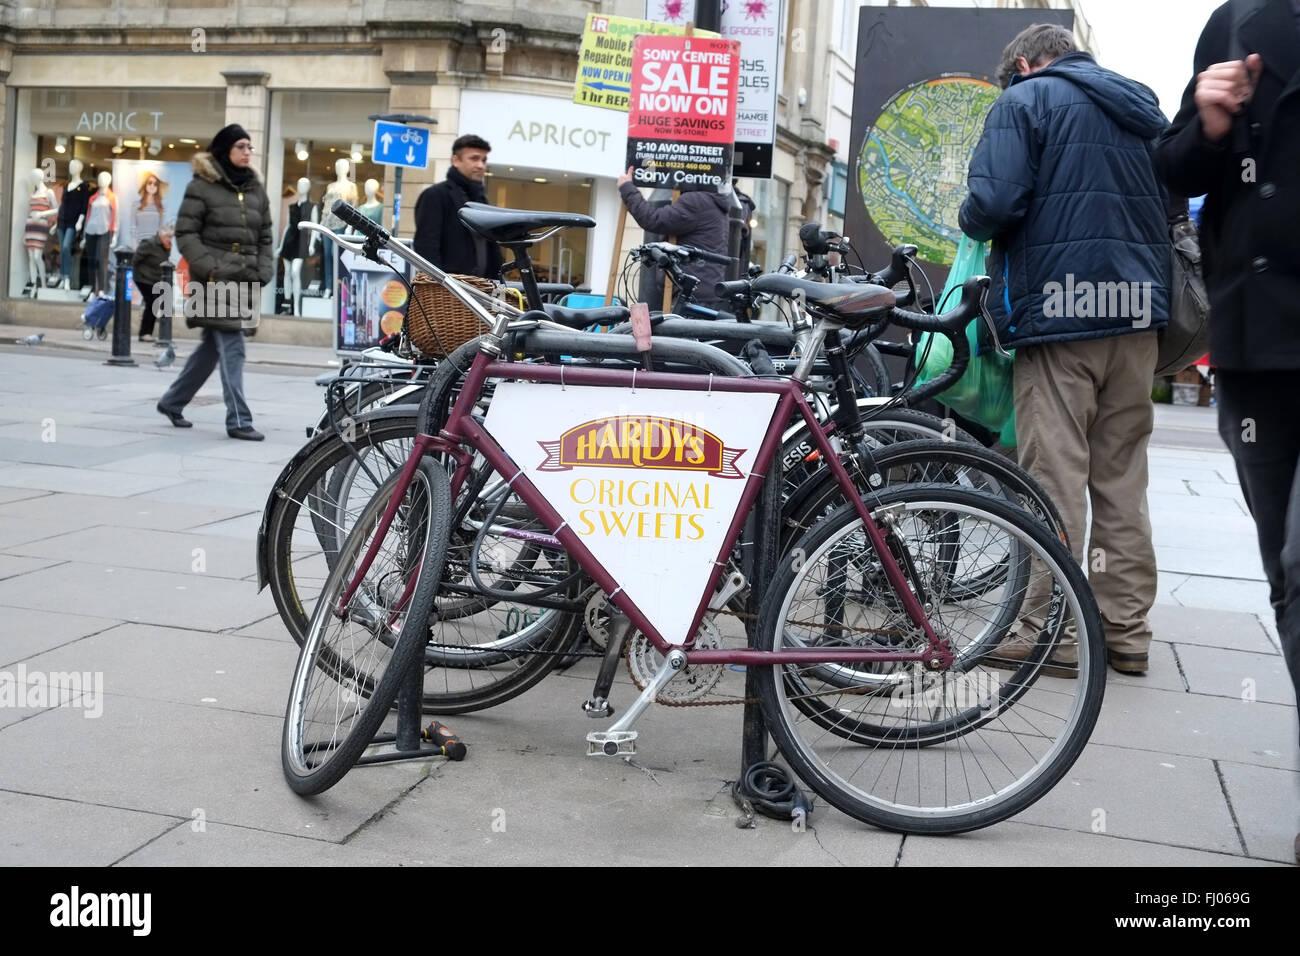 hardys bike shop